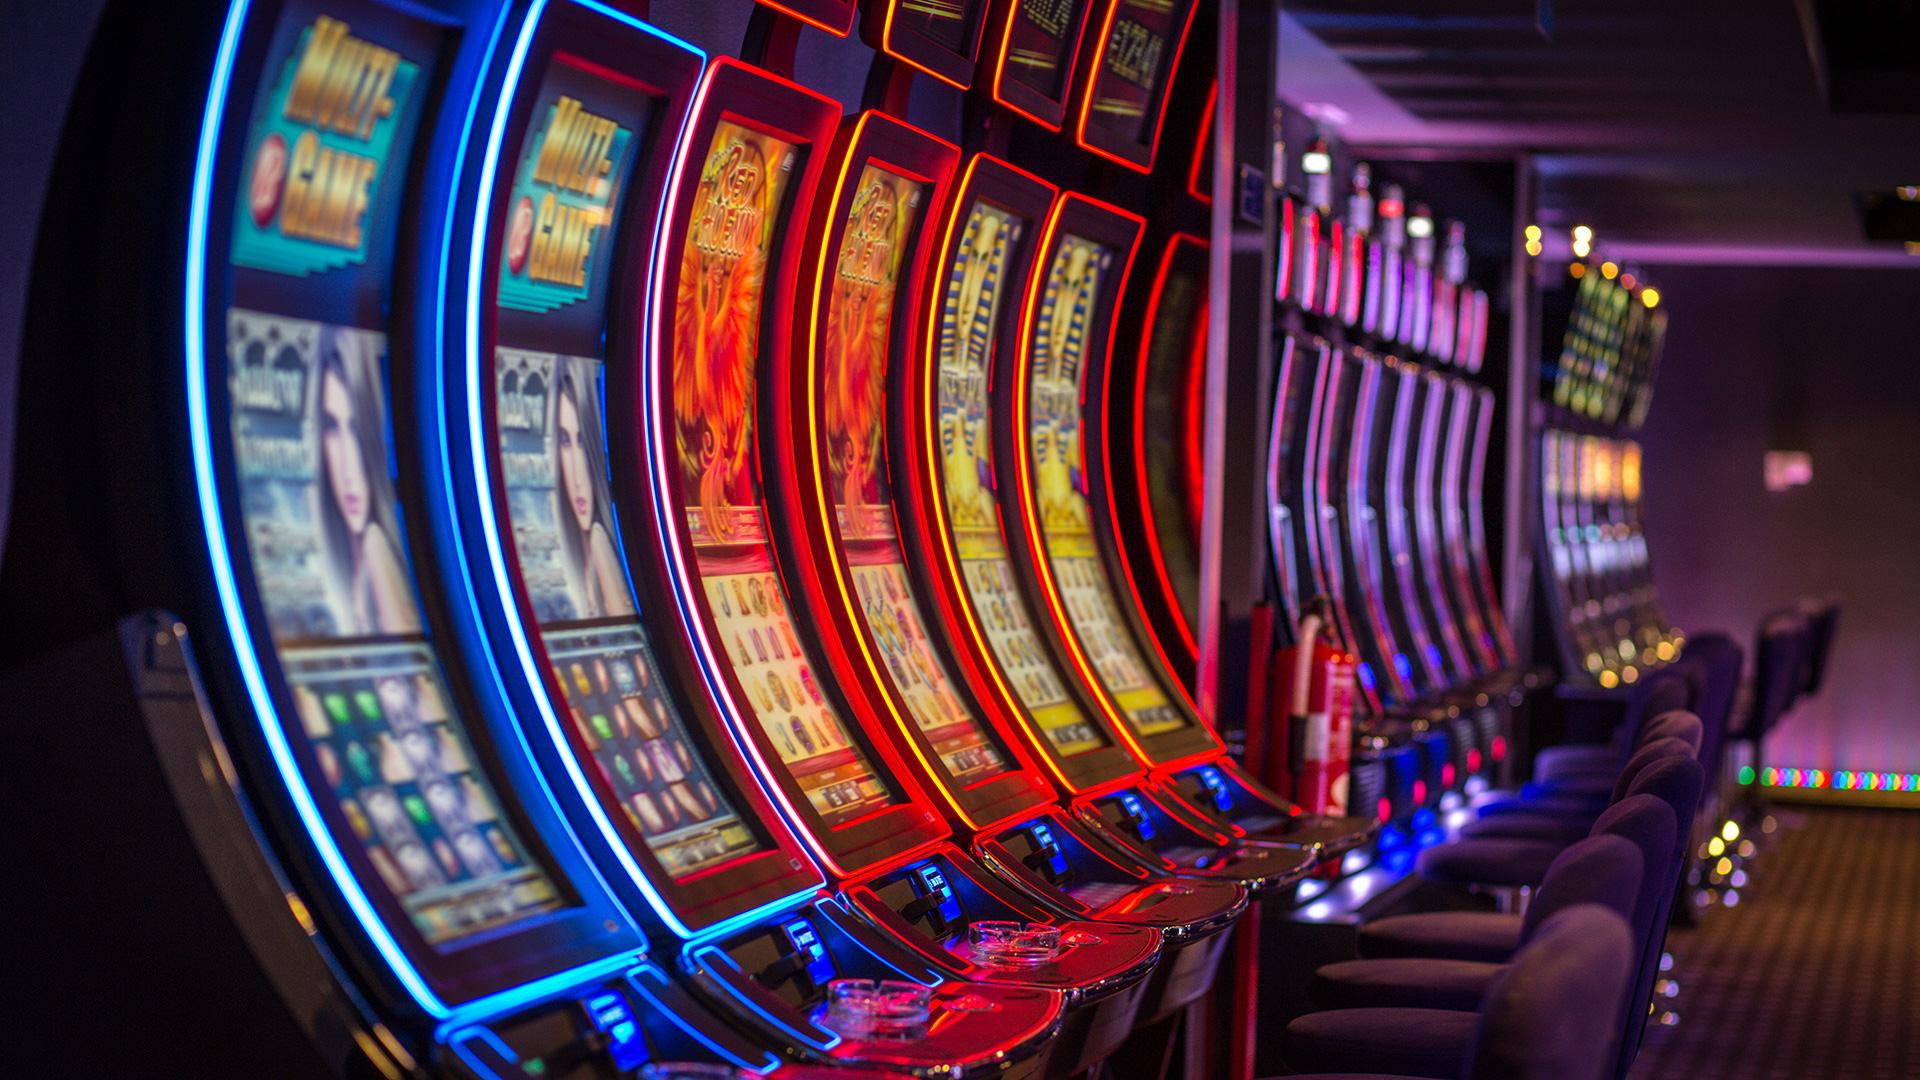 Jackpothöhe Lotteriespiele Las - 388594